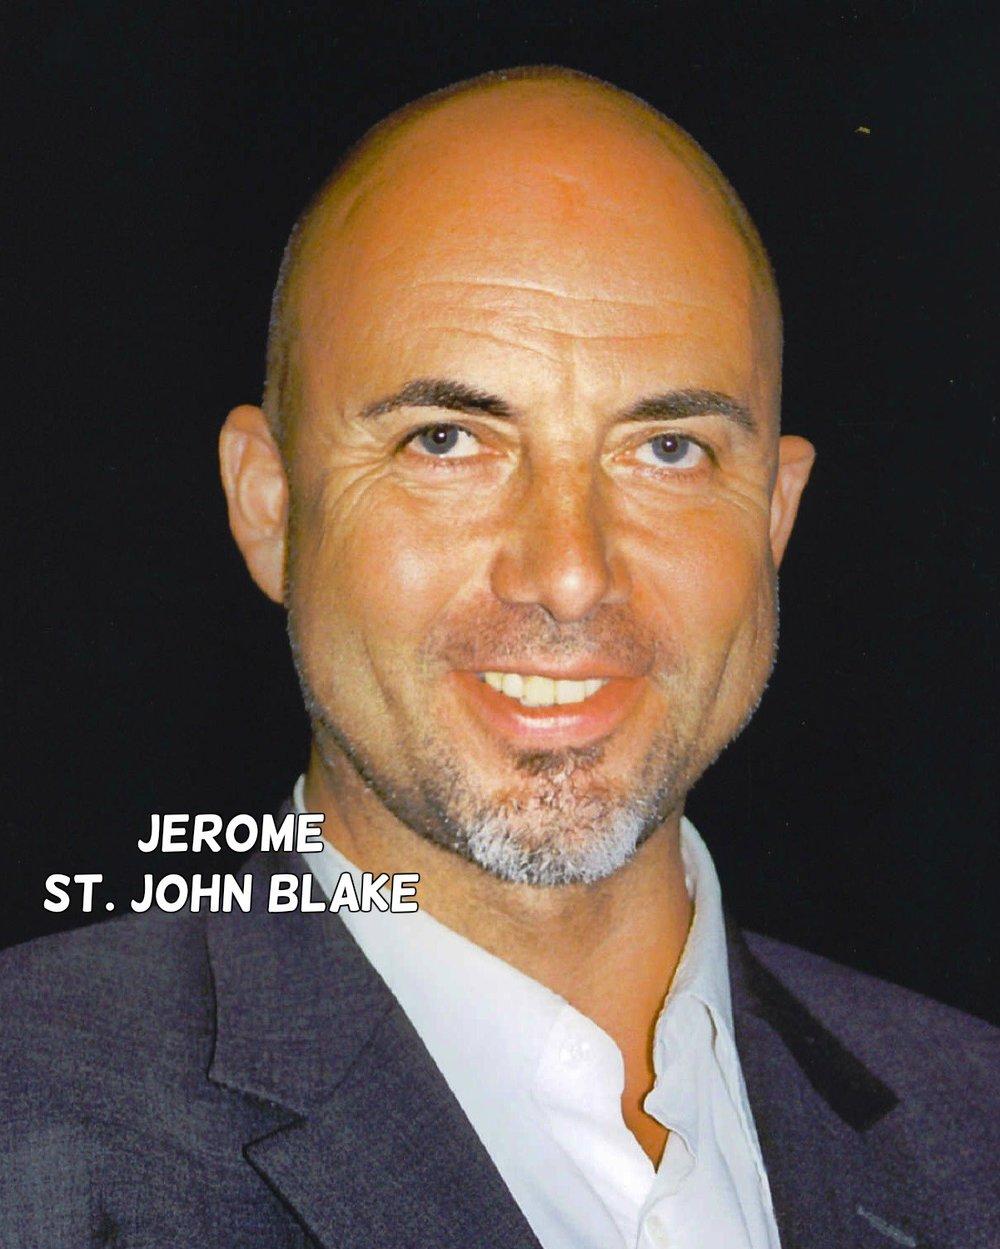 JeromeBlake1 Edit.jpg